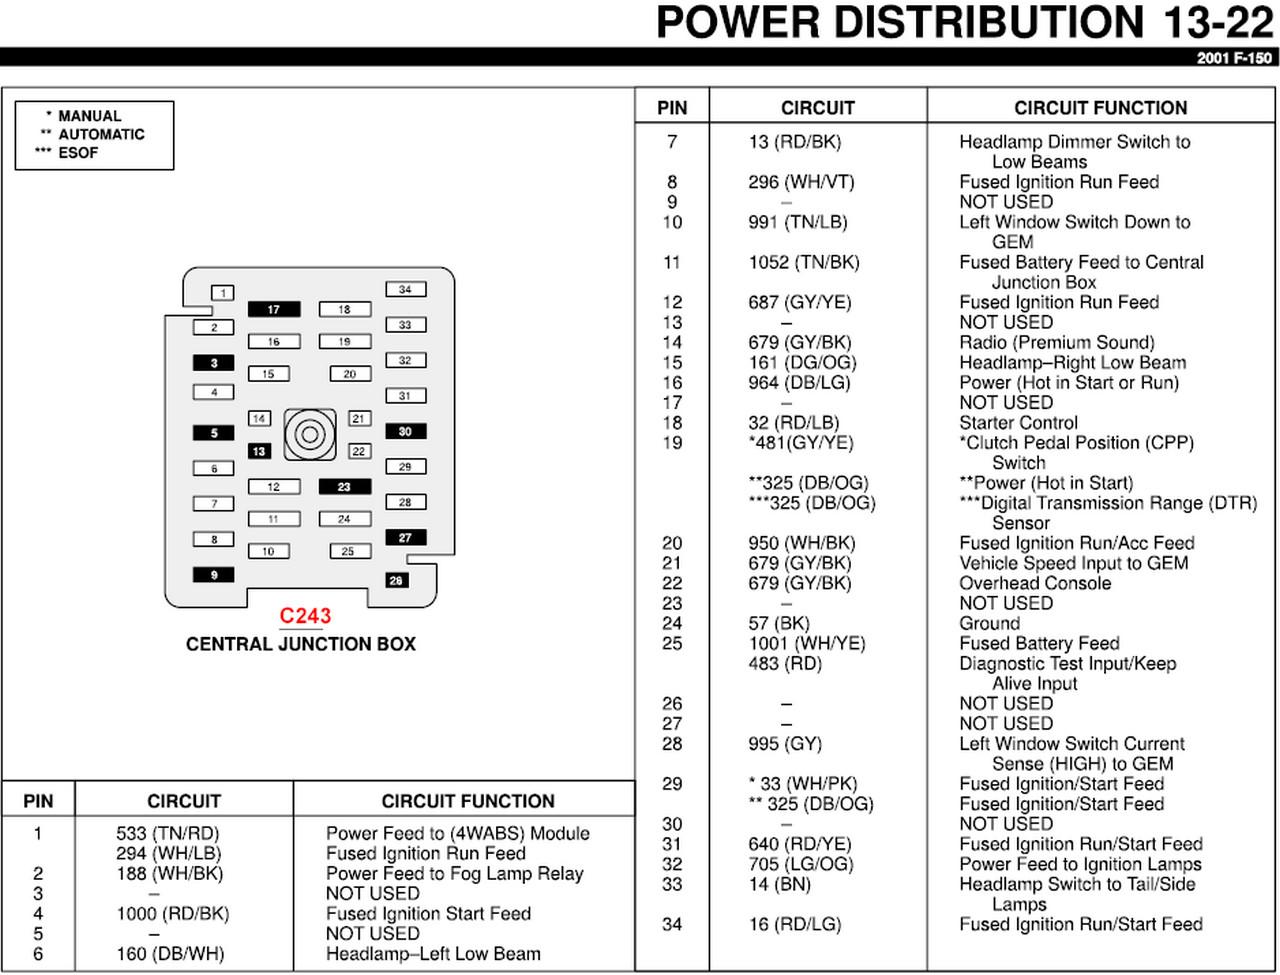 yamaha 703 remote control wiring harness ewiring yamaha 703 remote control wiring solidfonts